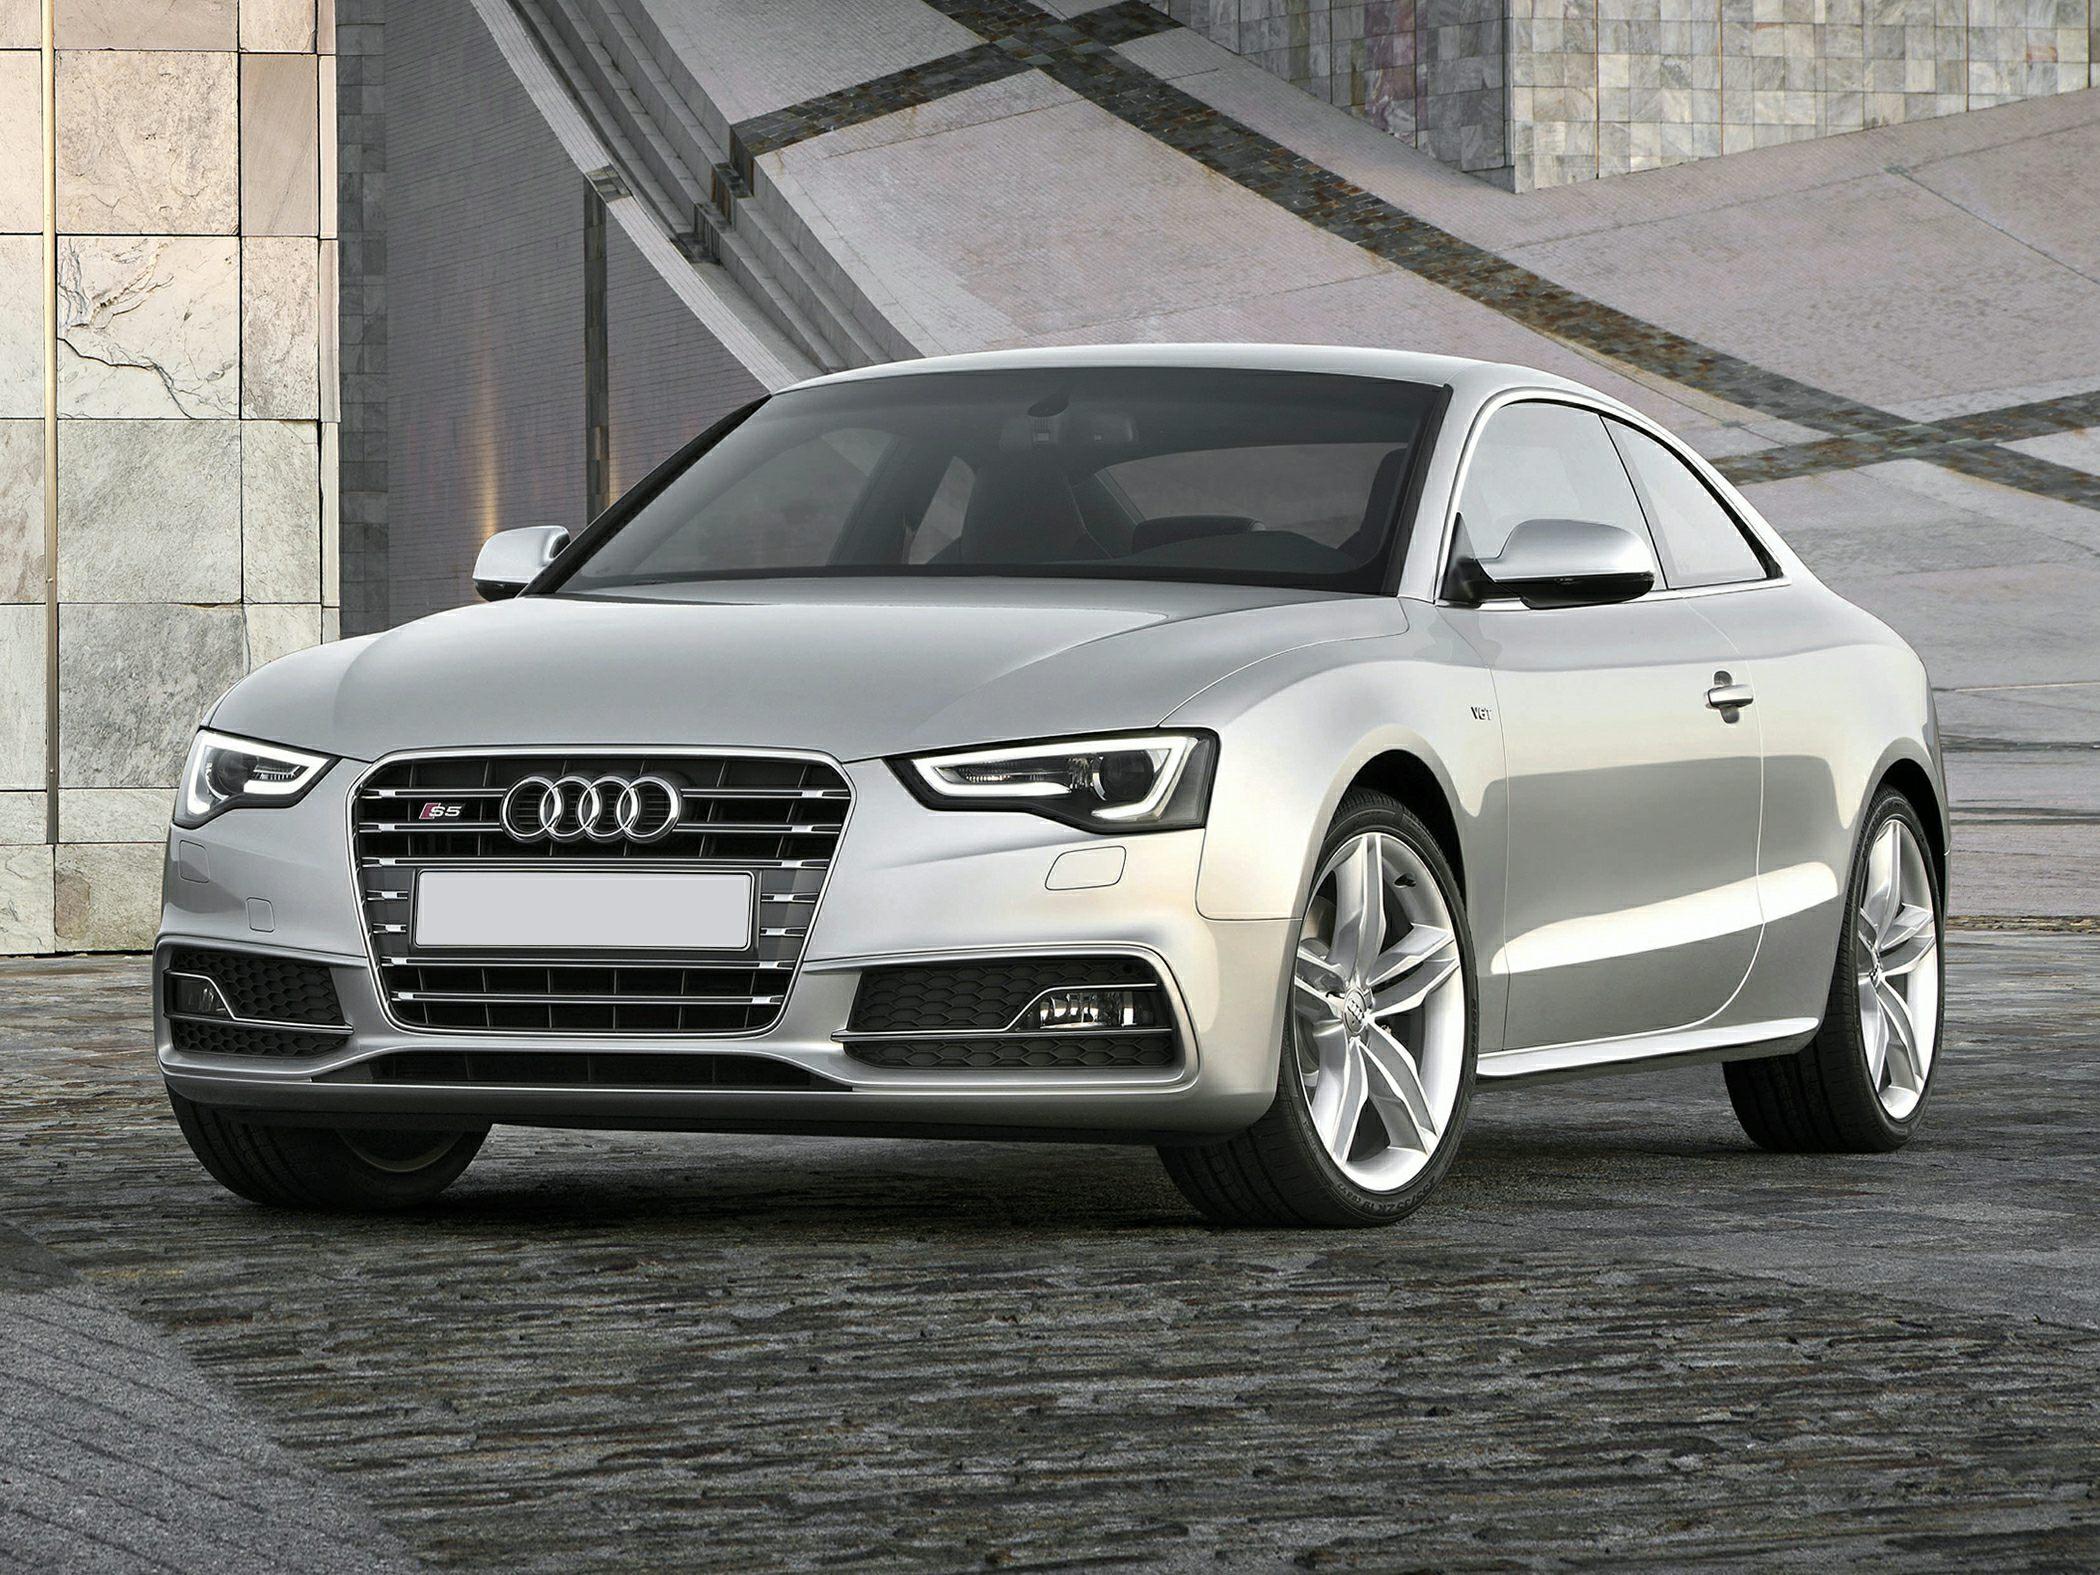 2015 Audi S5 Glam